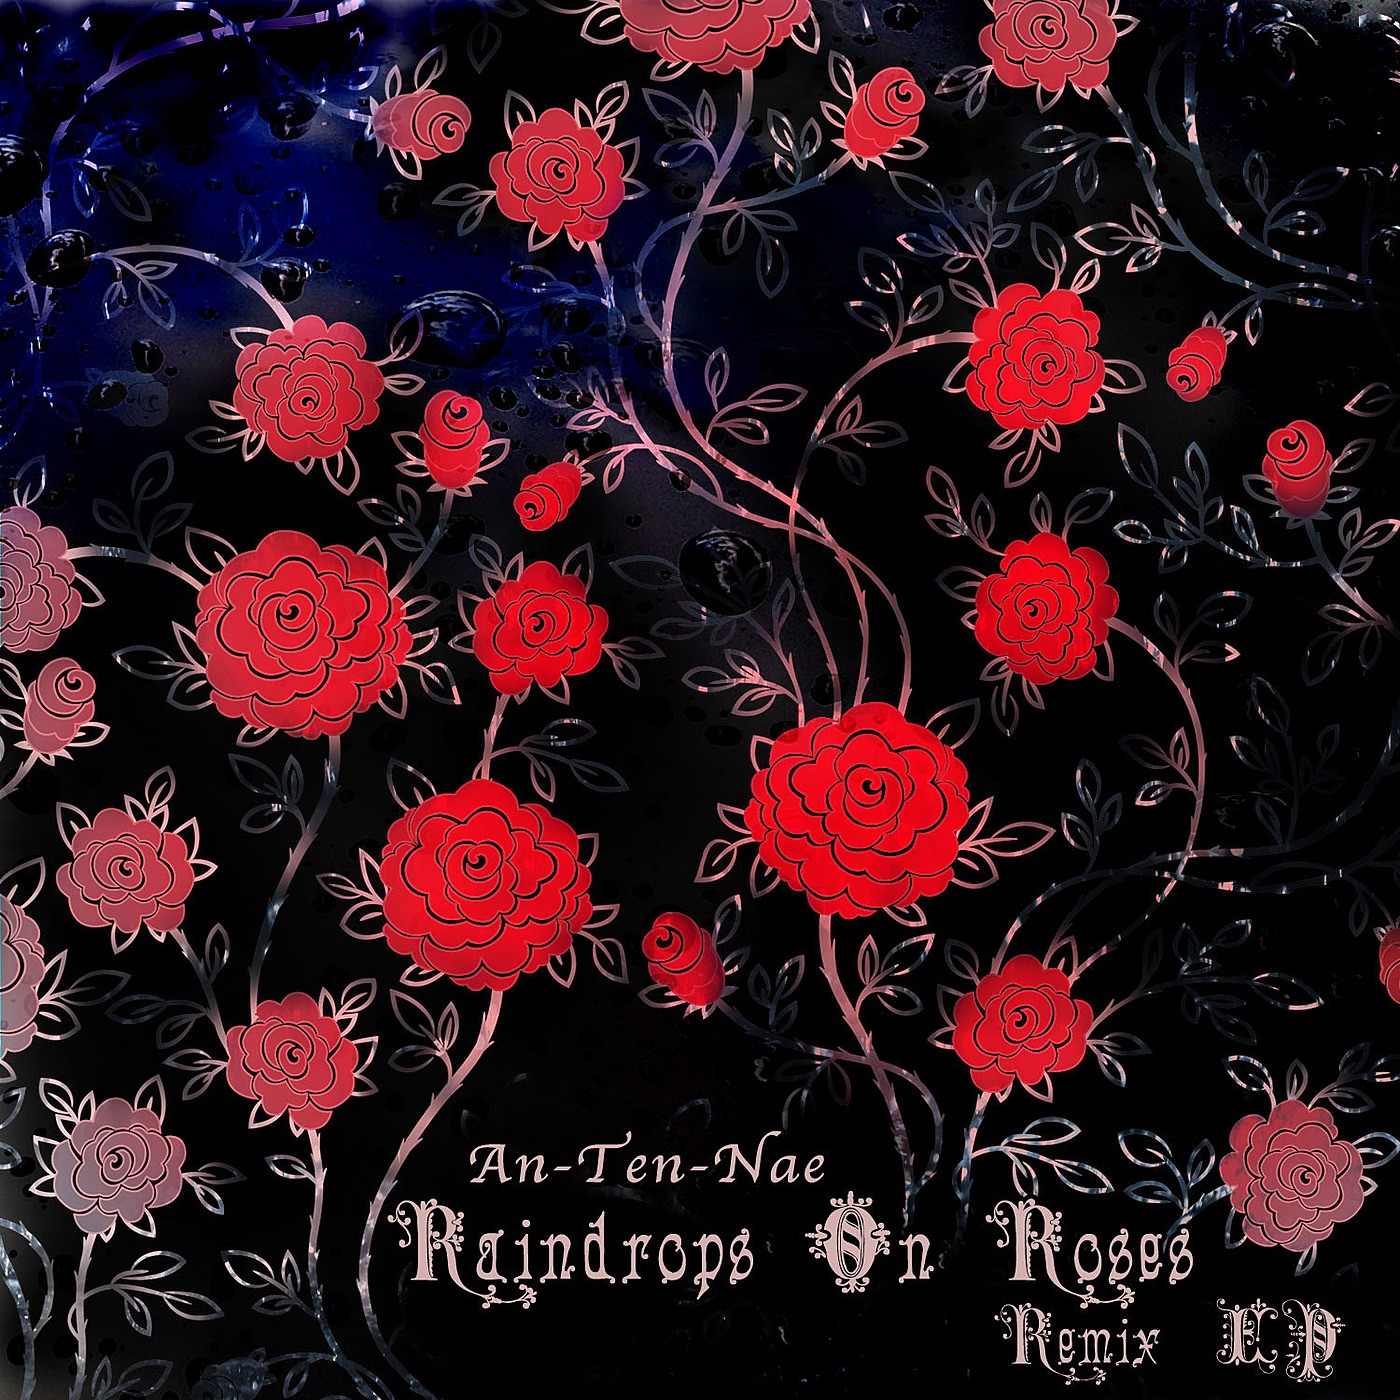 Raindrops On Roses Remix EP